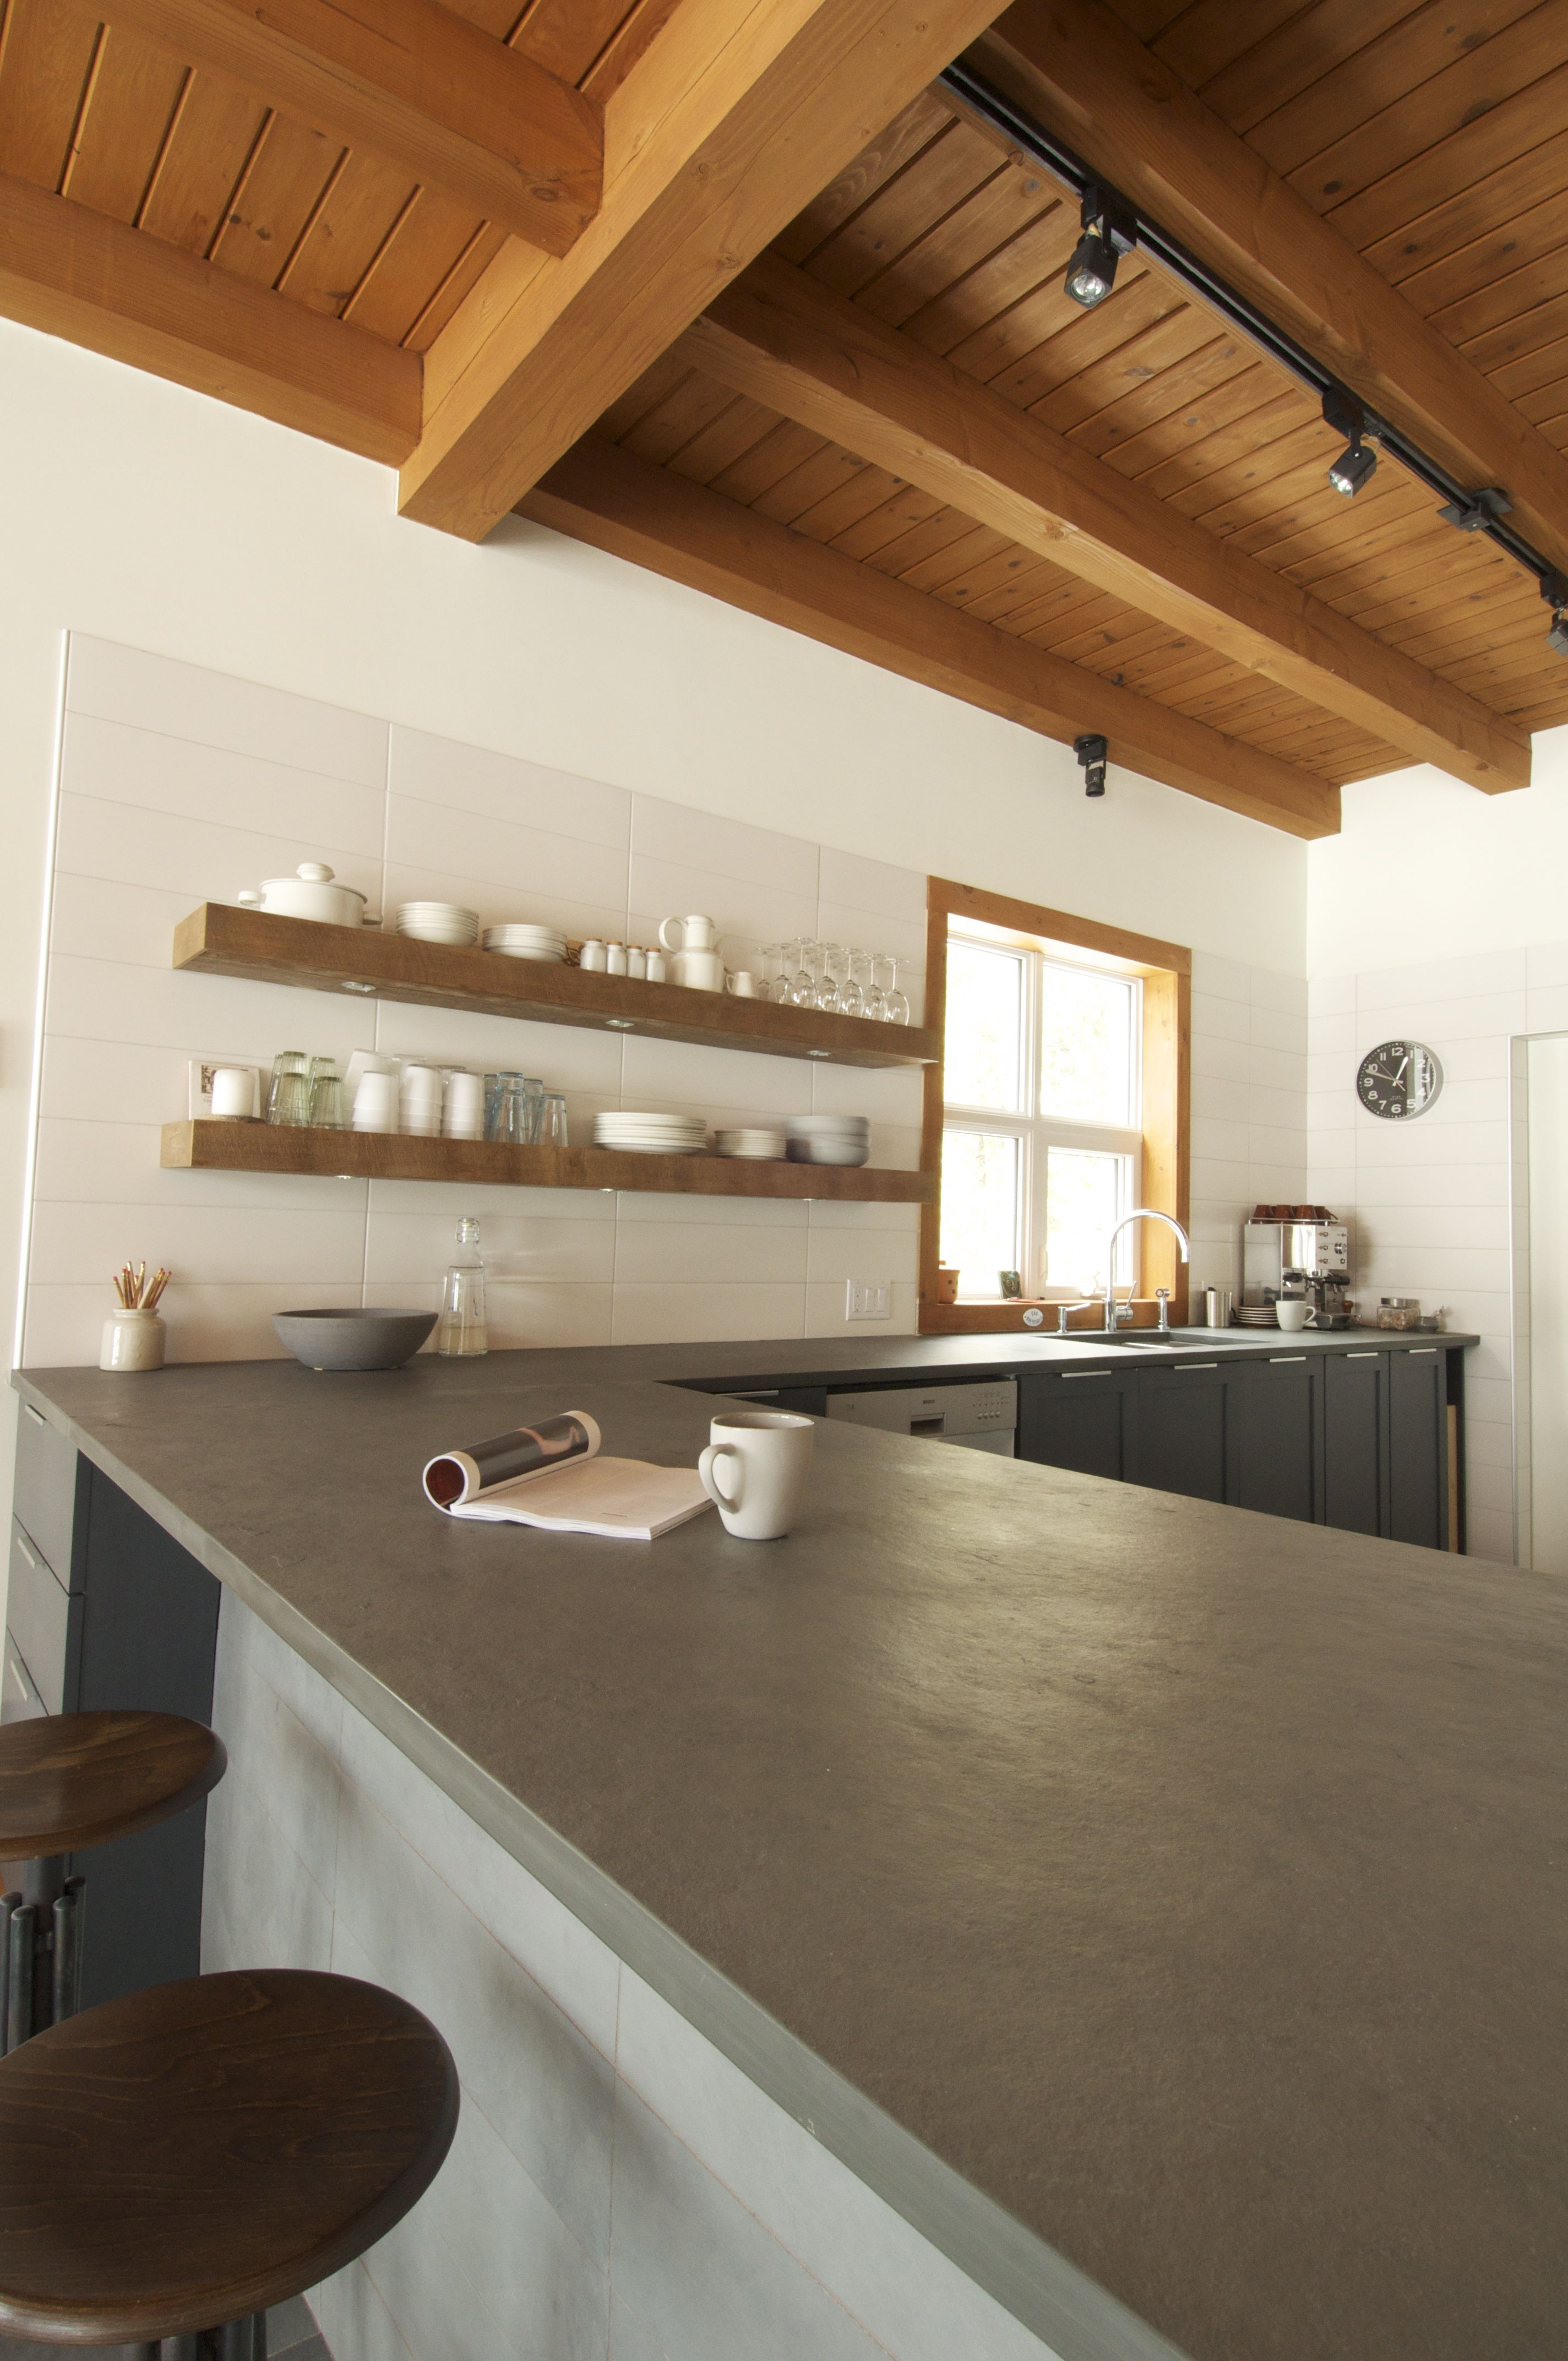 Stone Counterop_Brazilian Slate By Ceragres #stone #slate #countertop  #kitchen